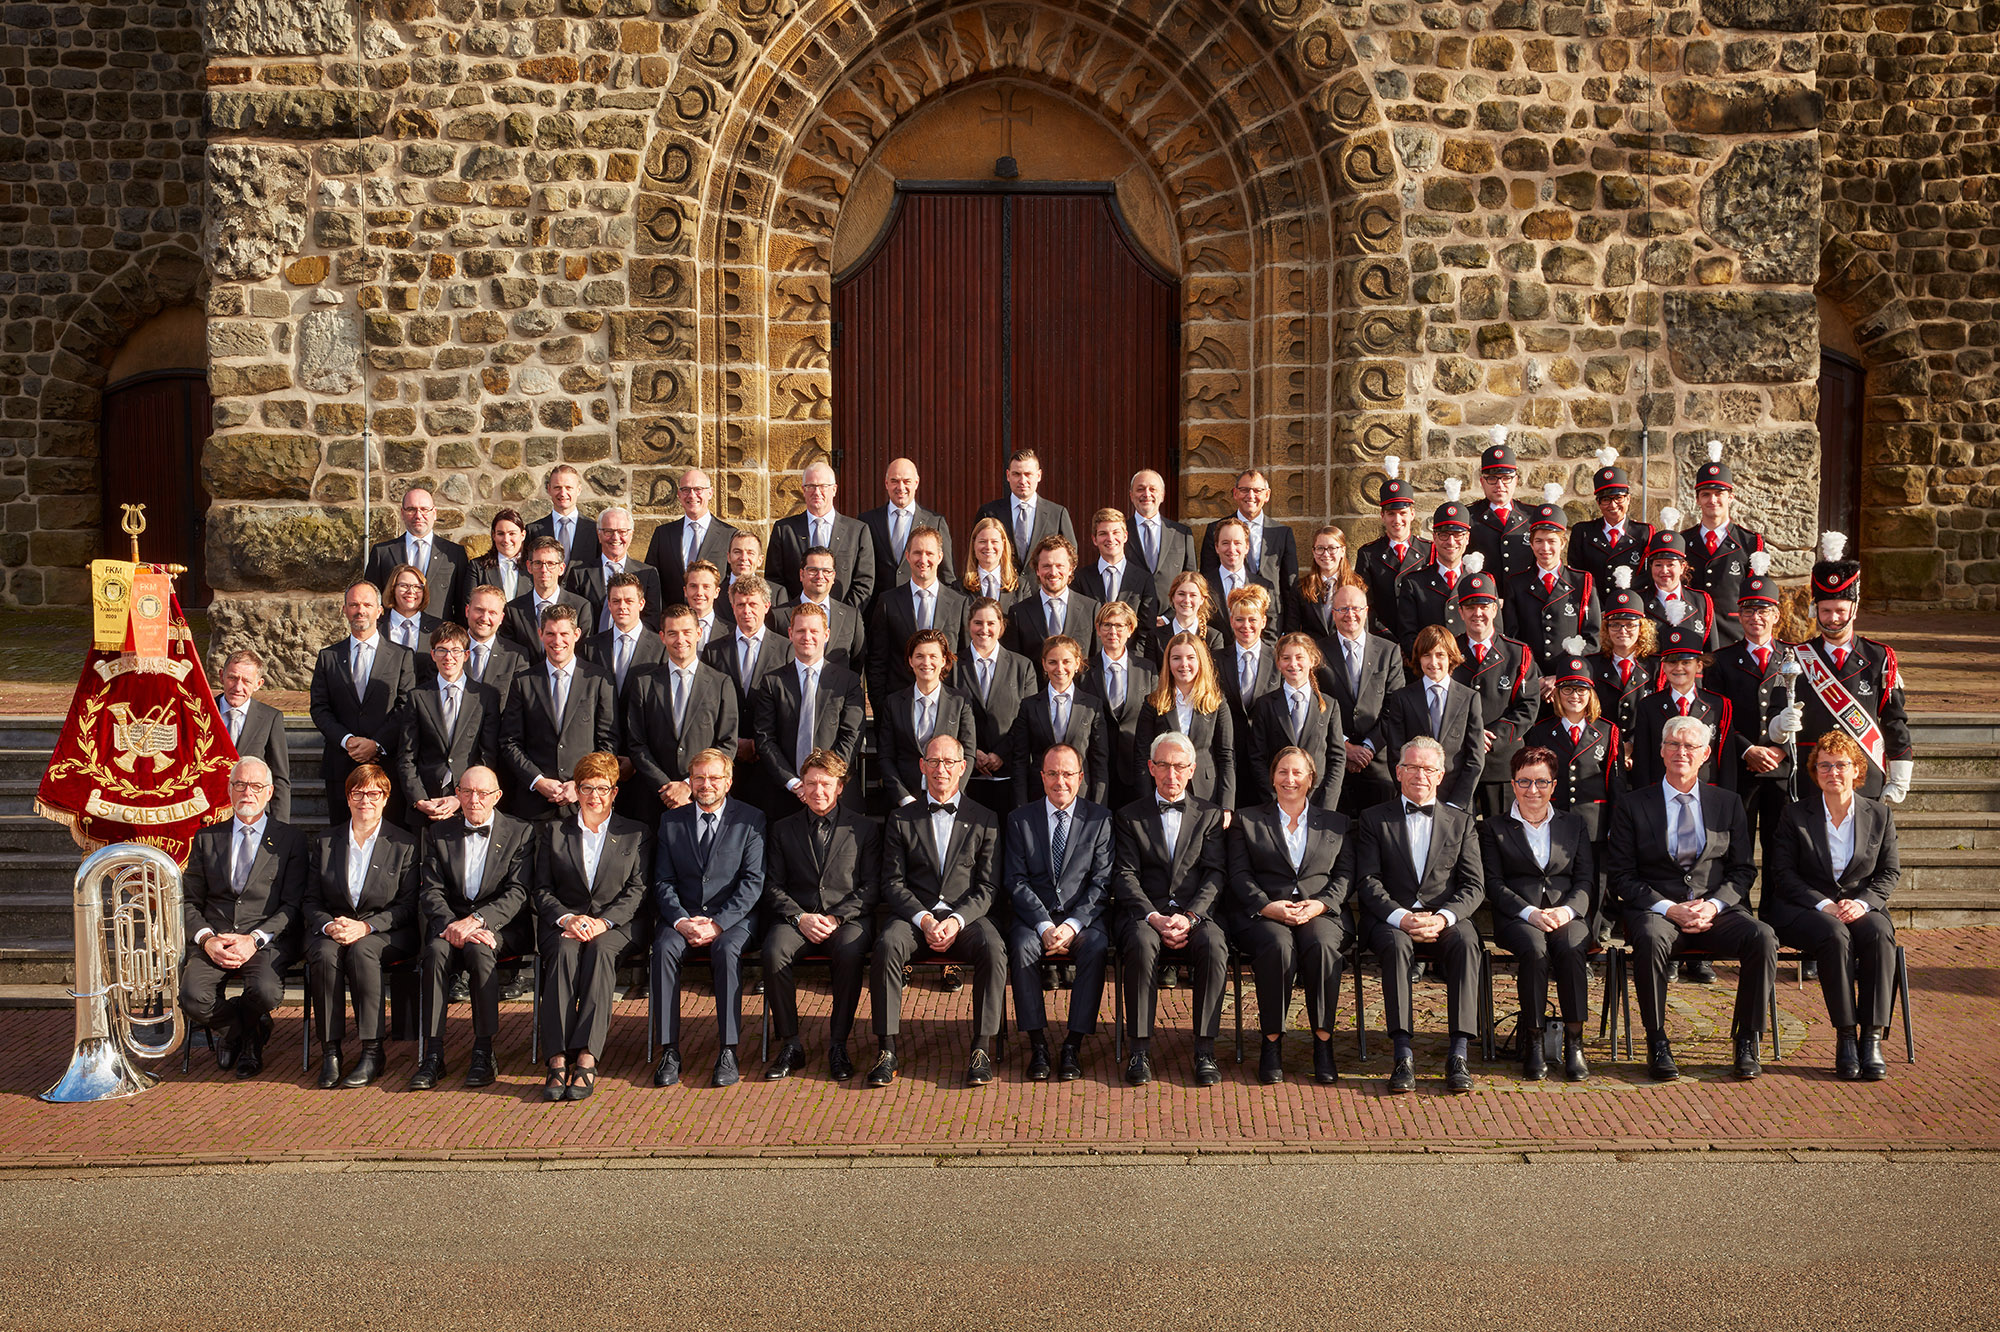 SPUISERS groepsfoto fanfare Sint Caecilia Schimmert 19 nov 2017